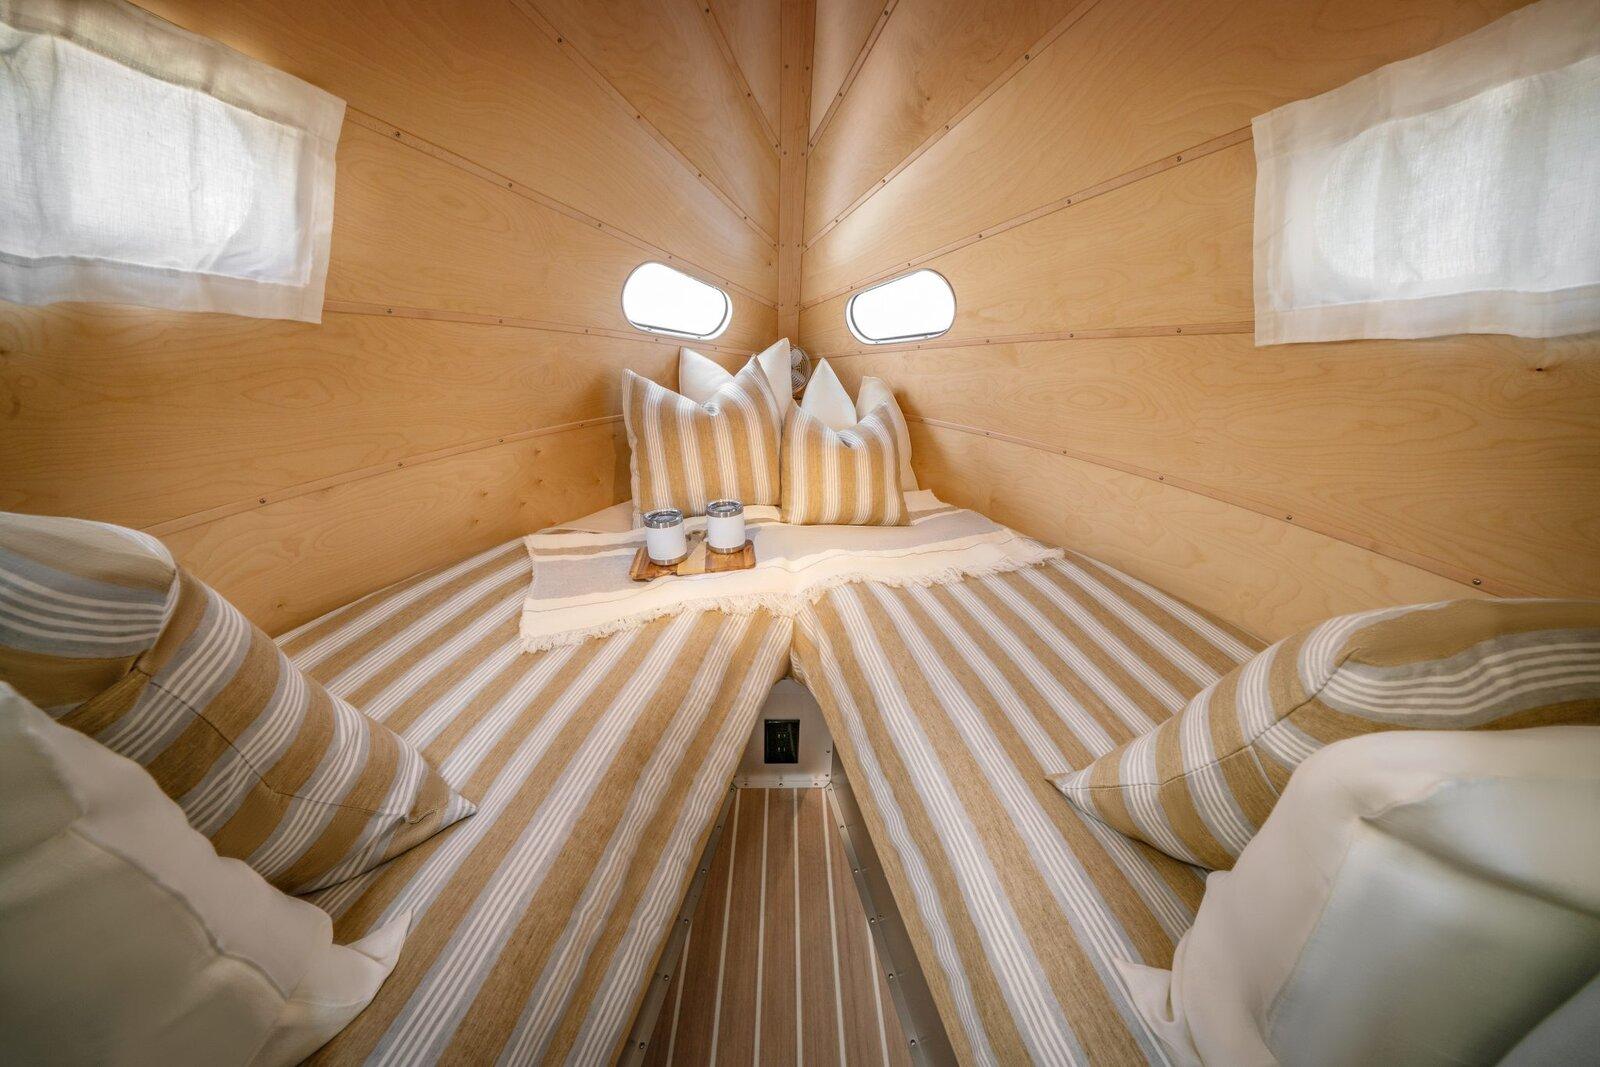 Bowlus Travel Trailer bedroom